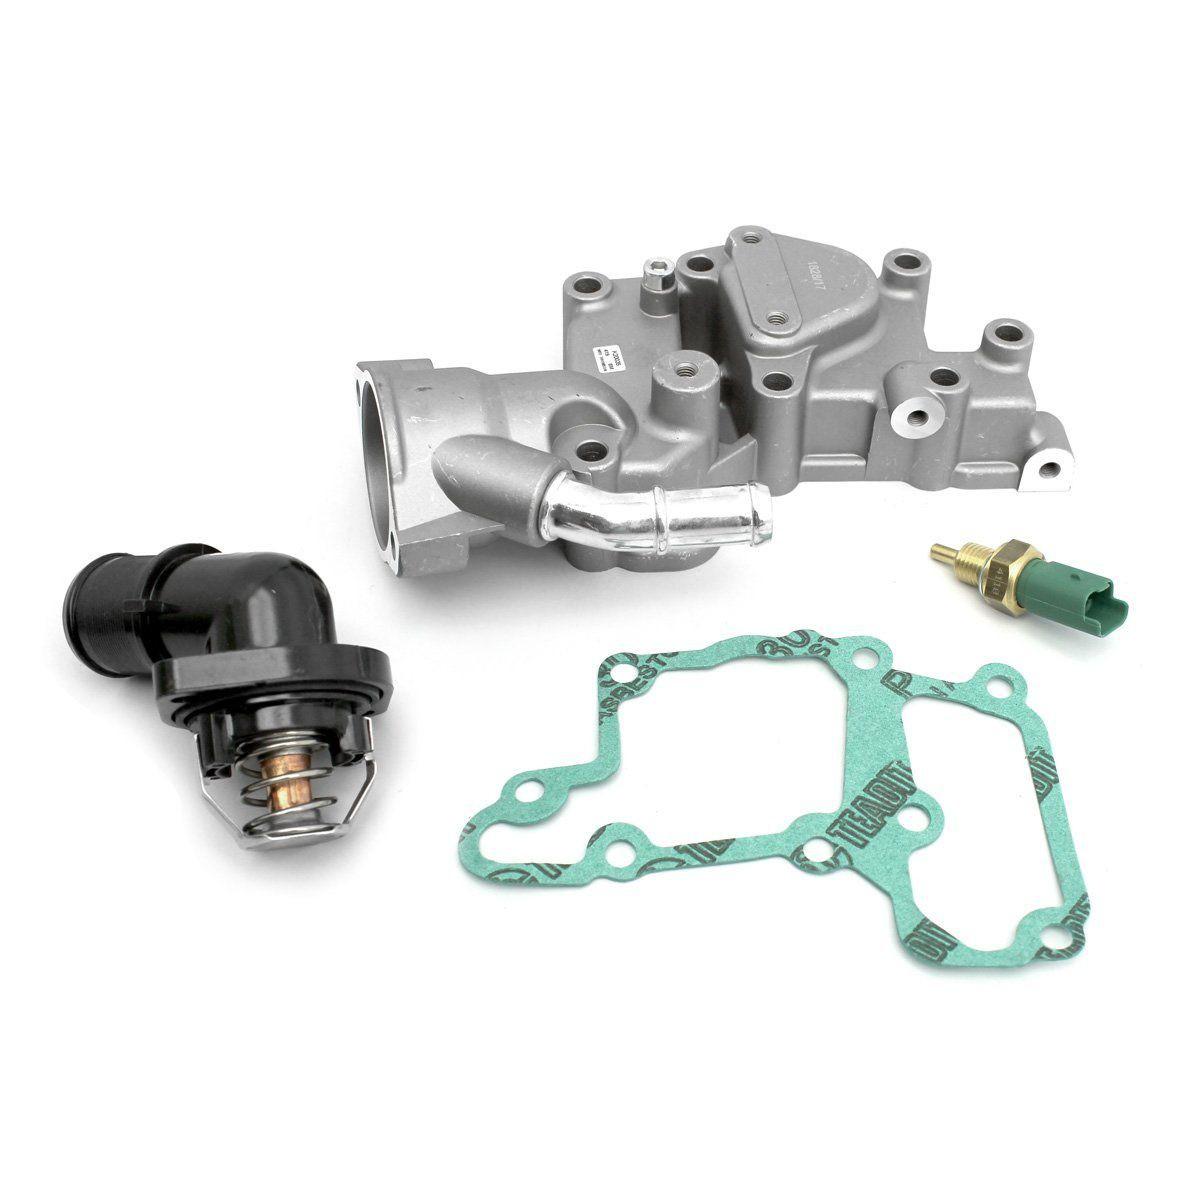 Válvula Termostática e Carcaça Peugeot 206 Citroen C3 1.4